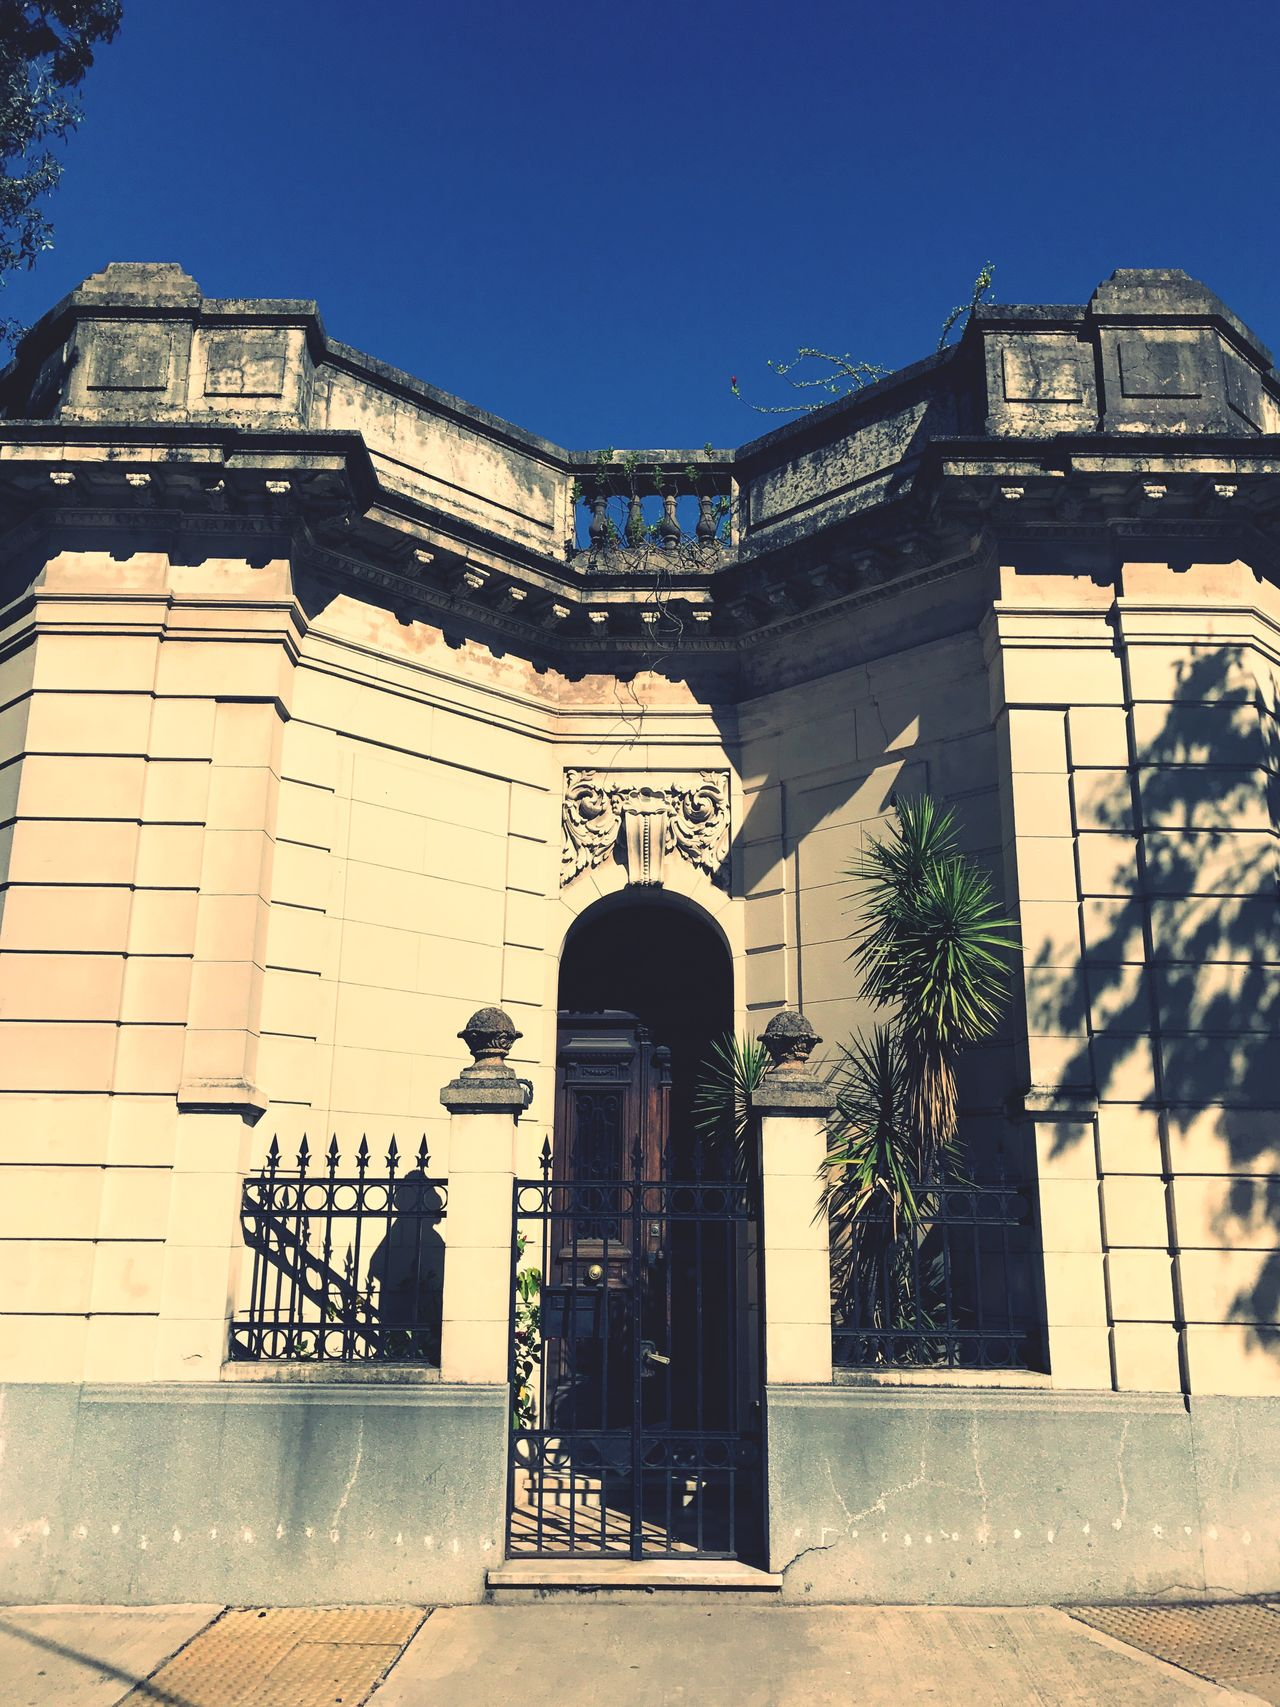 Architecture Building Exterior Built Structure Entrance Outdoors Sunlight No People Clear Sky City Façade Balcony Day Tree Sky Barrio De Flores Barrio De Flores Buenos Aires Argentina